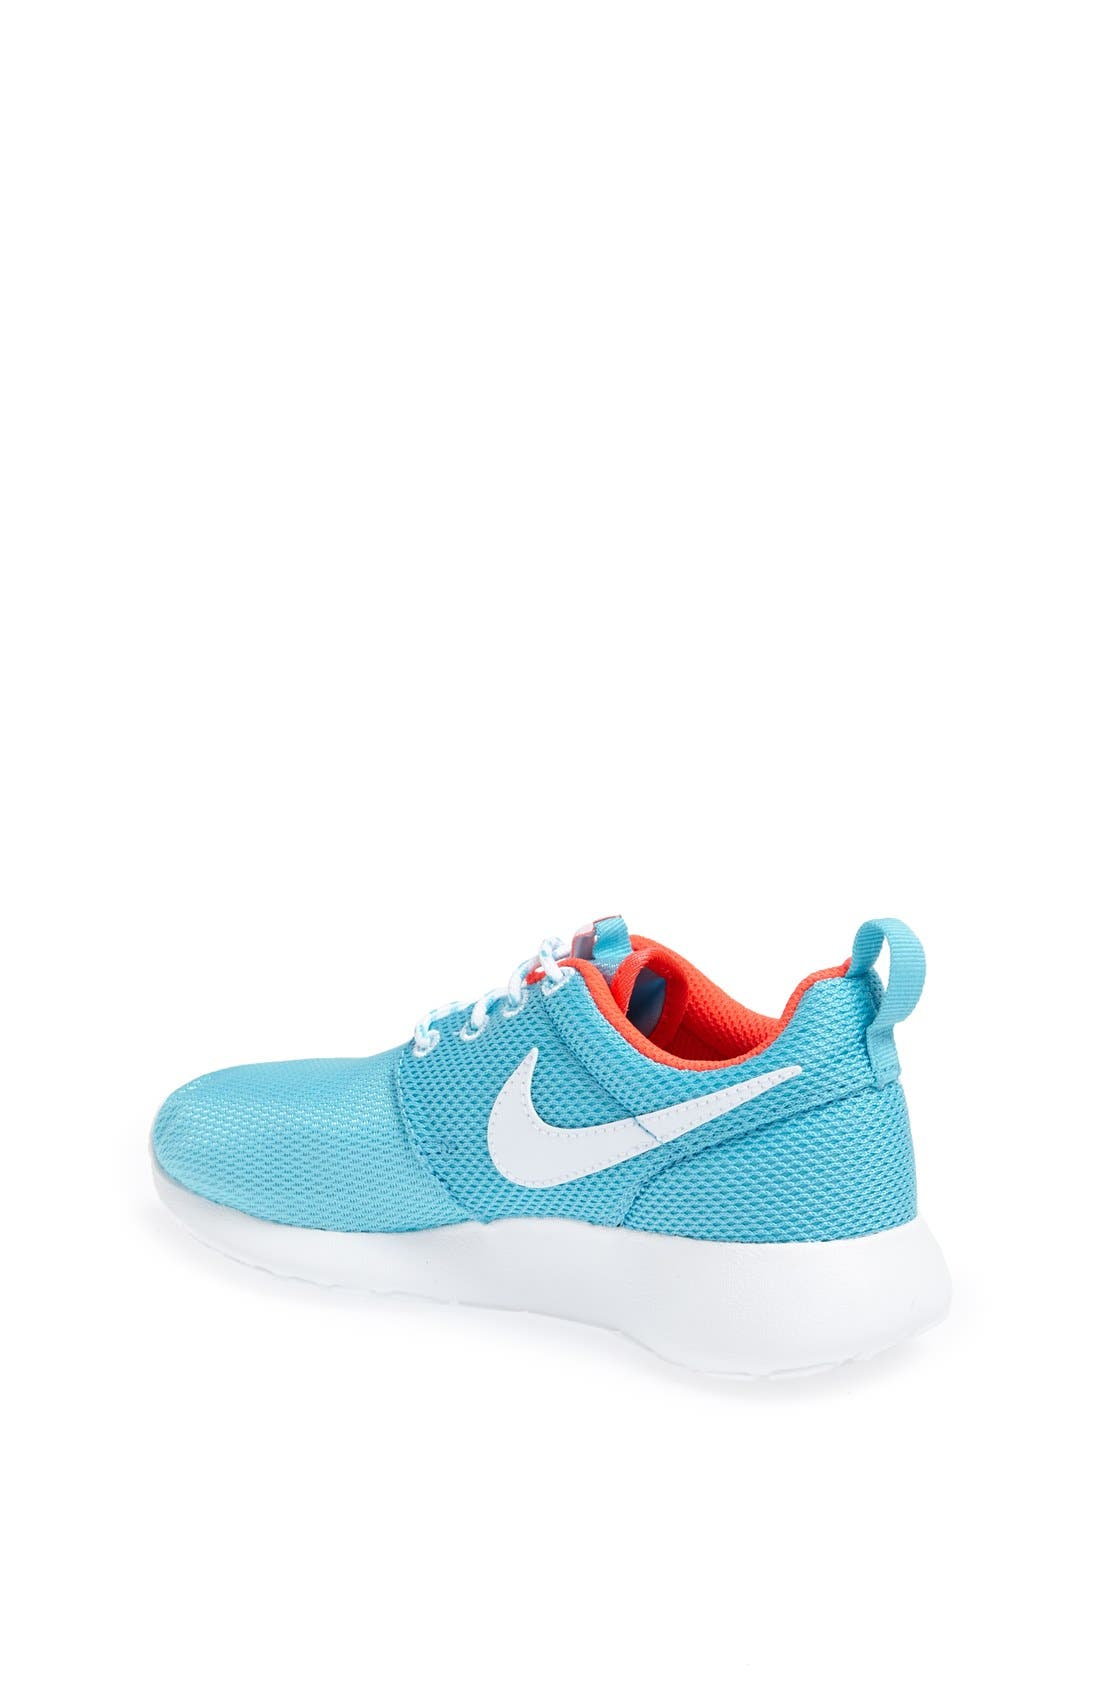 'Roshe Run' Athletic Shoe,                             Alternate thumbnail 129, color,